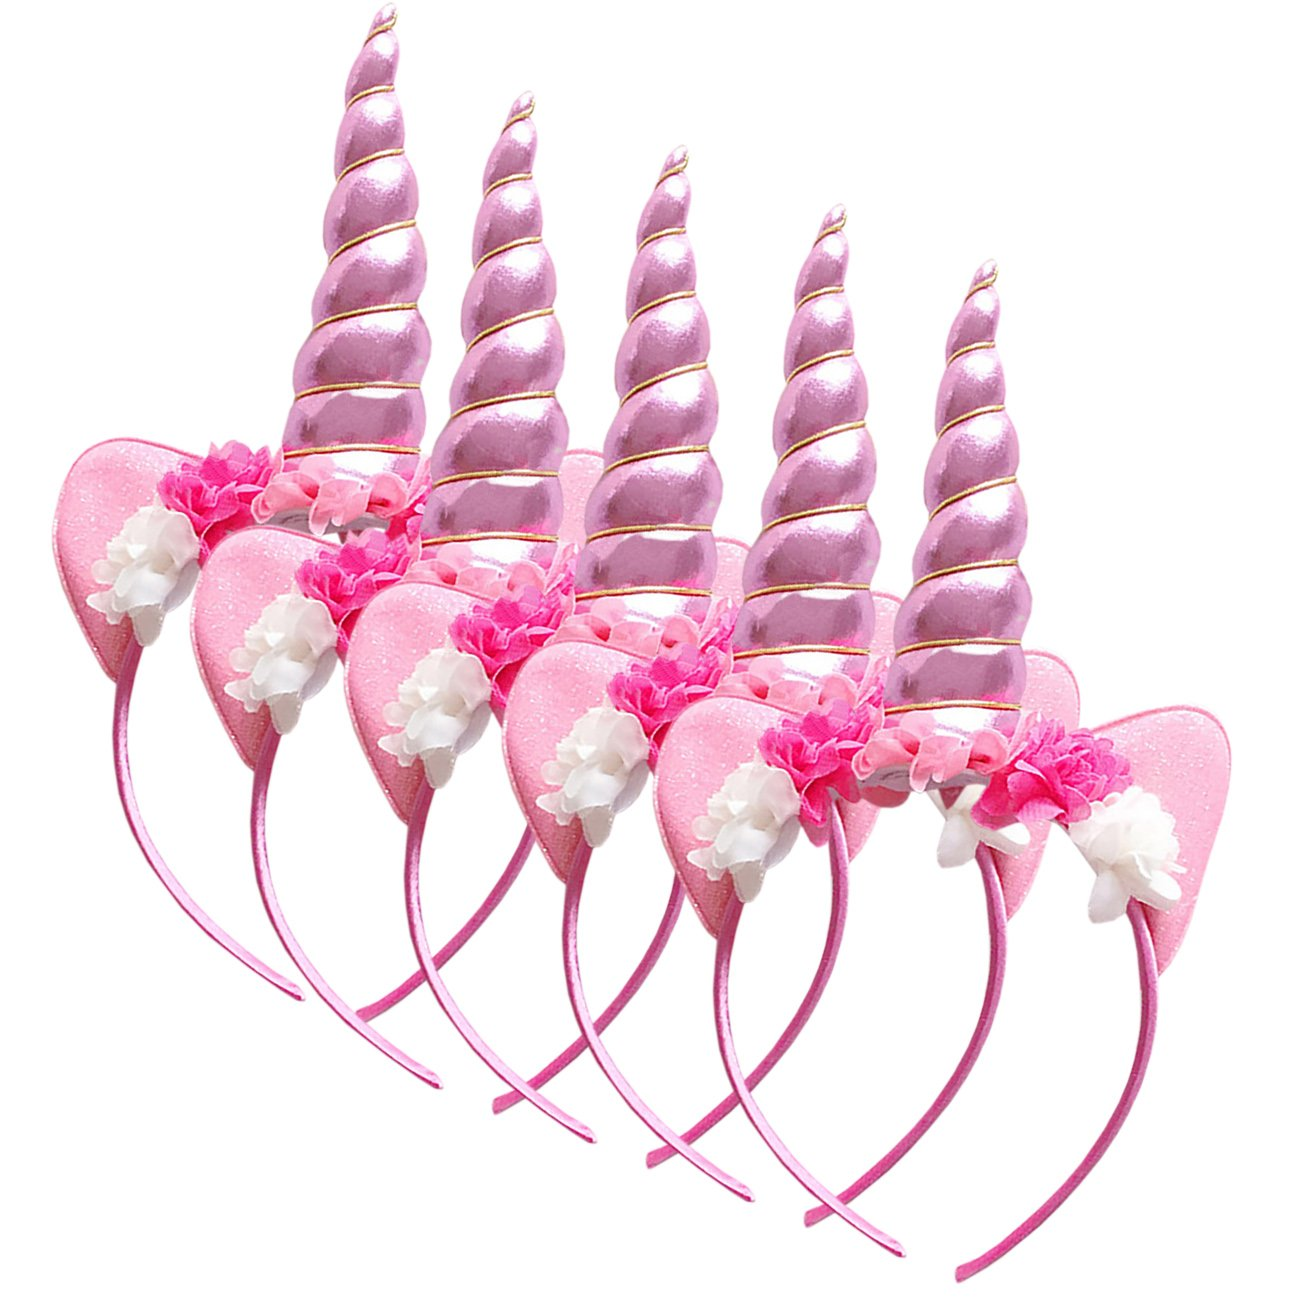 THEE Kid Girls Unicorn Horn Head Party Hair Headband Fancy Dress Cosplay Decorative 5pcs